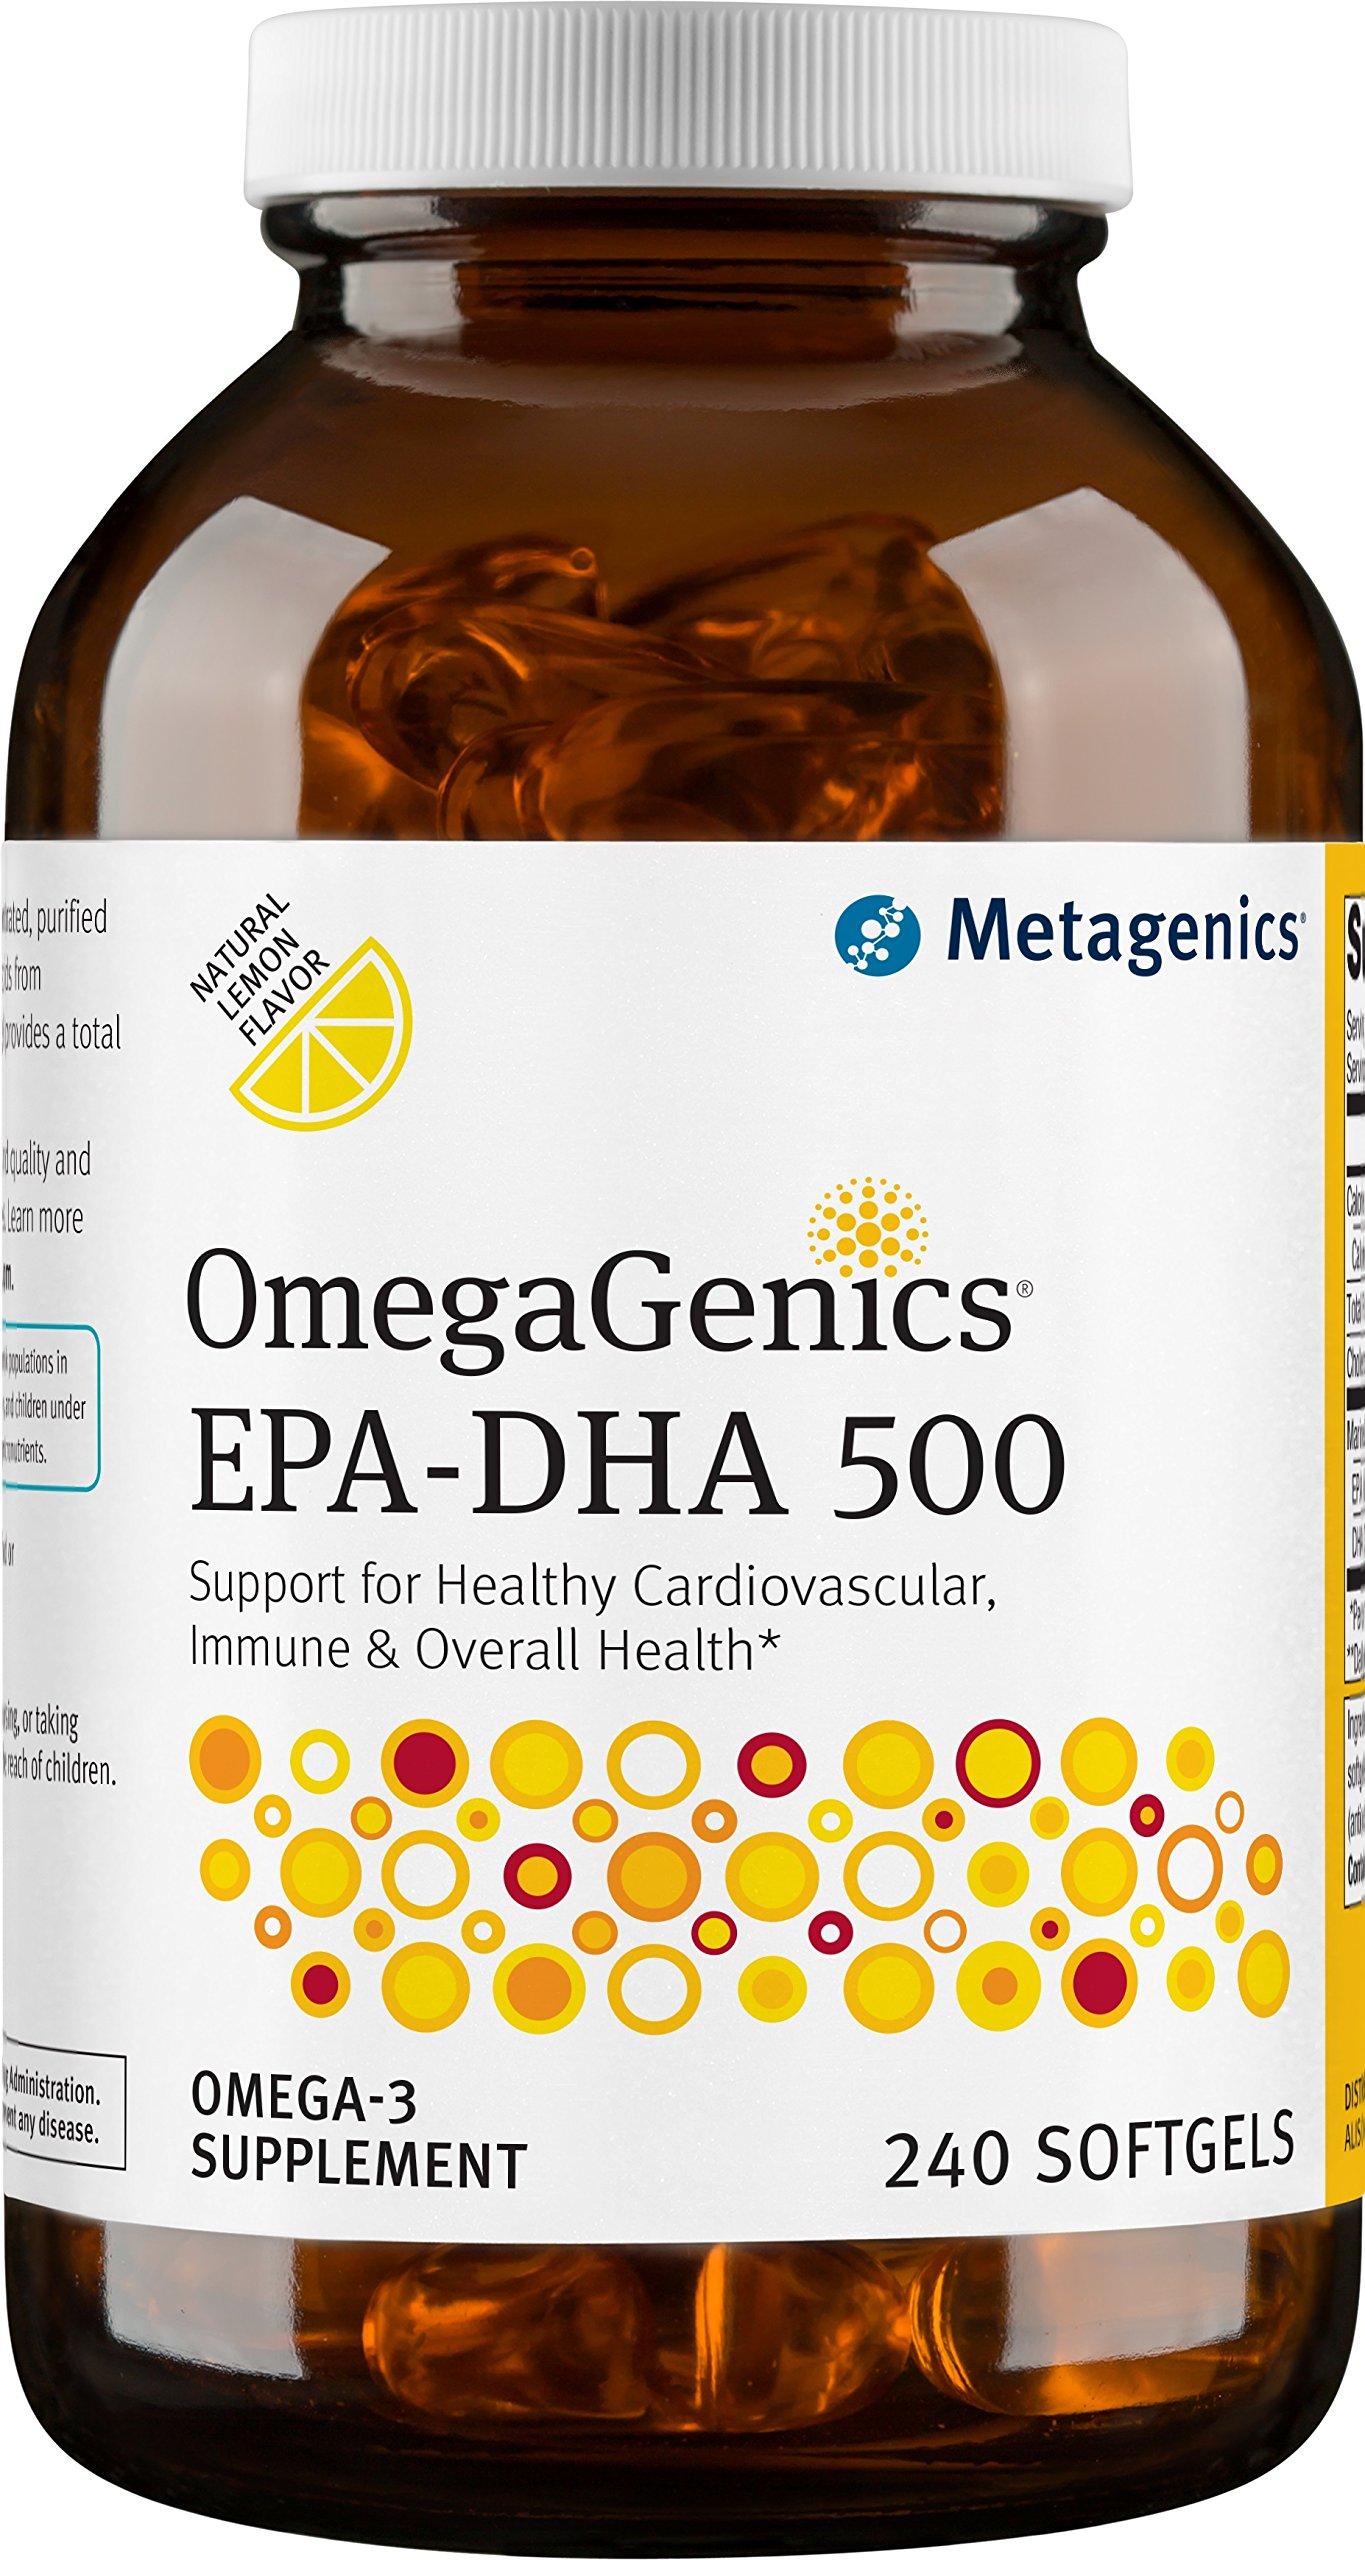 Metagenics - OmegaGenics EPA-DHA 500, 240 Count